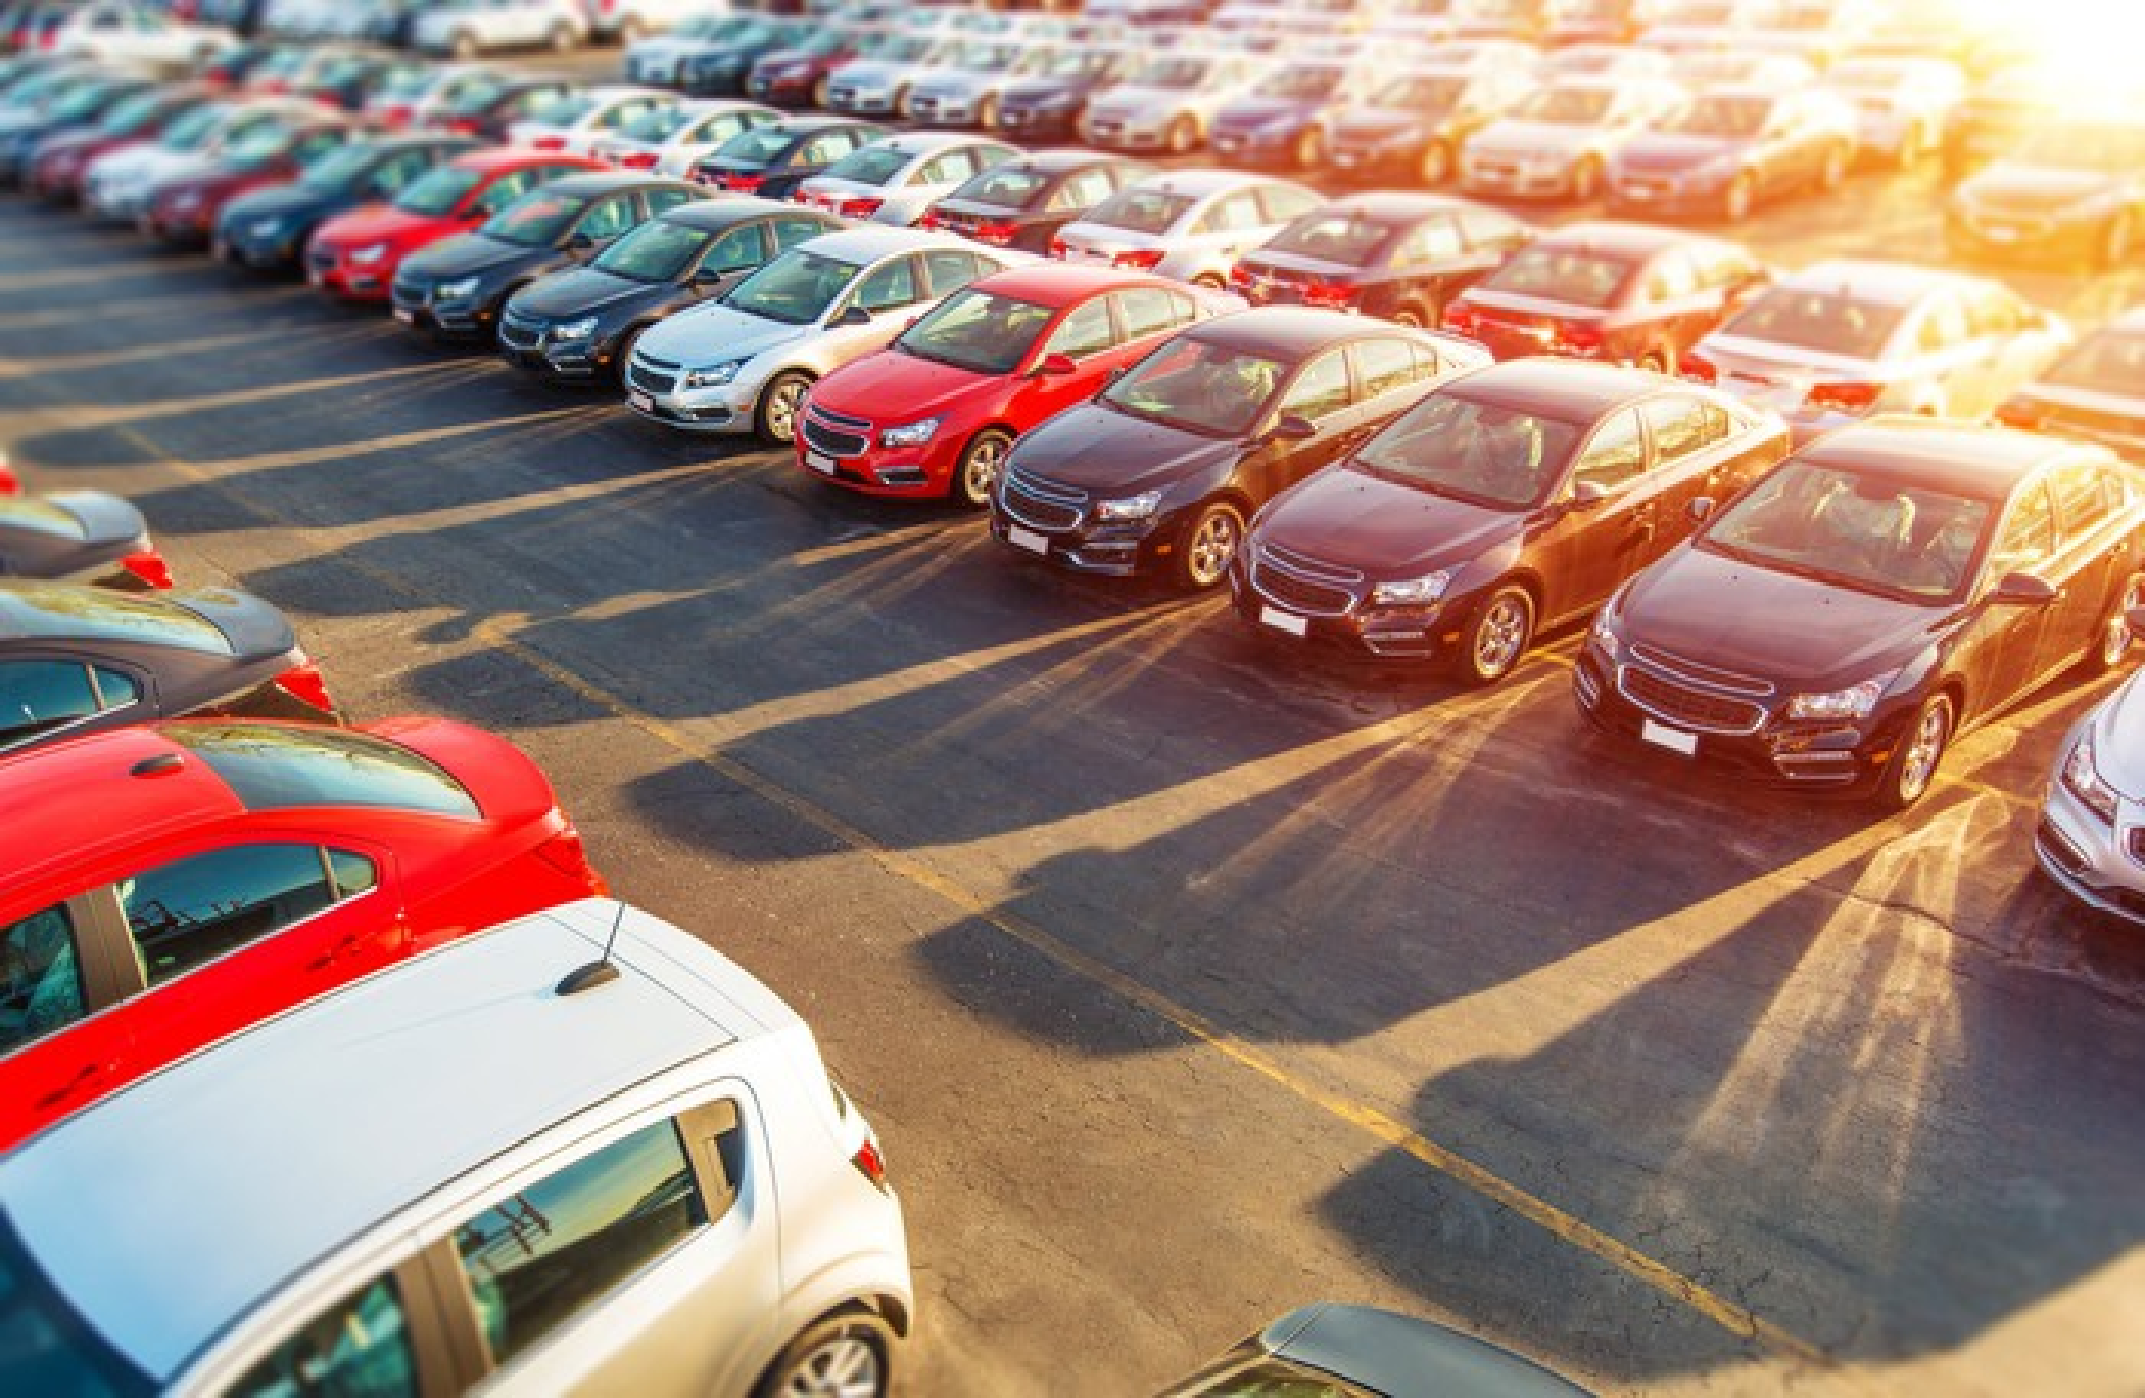 Rows of cars at a dealership lot